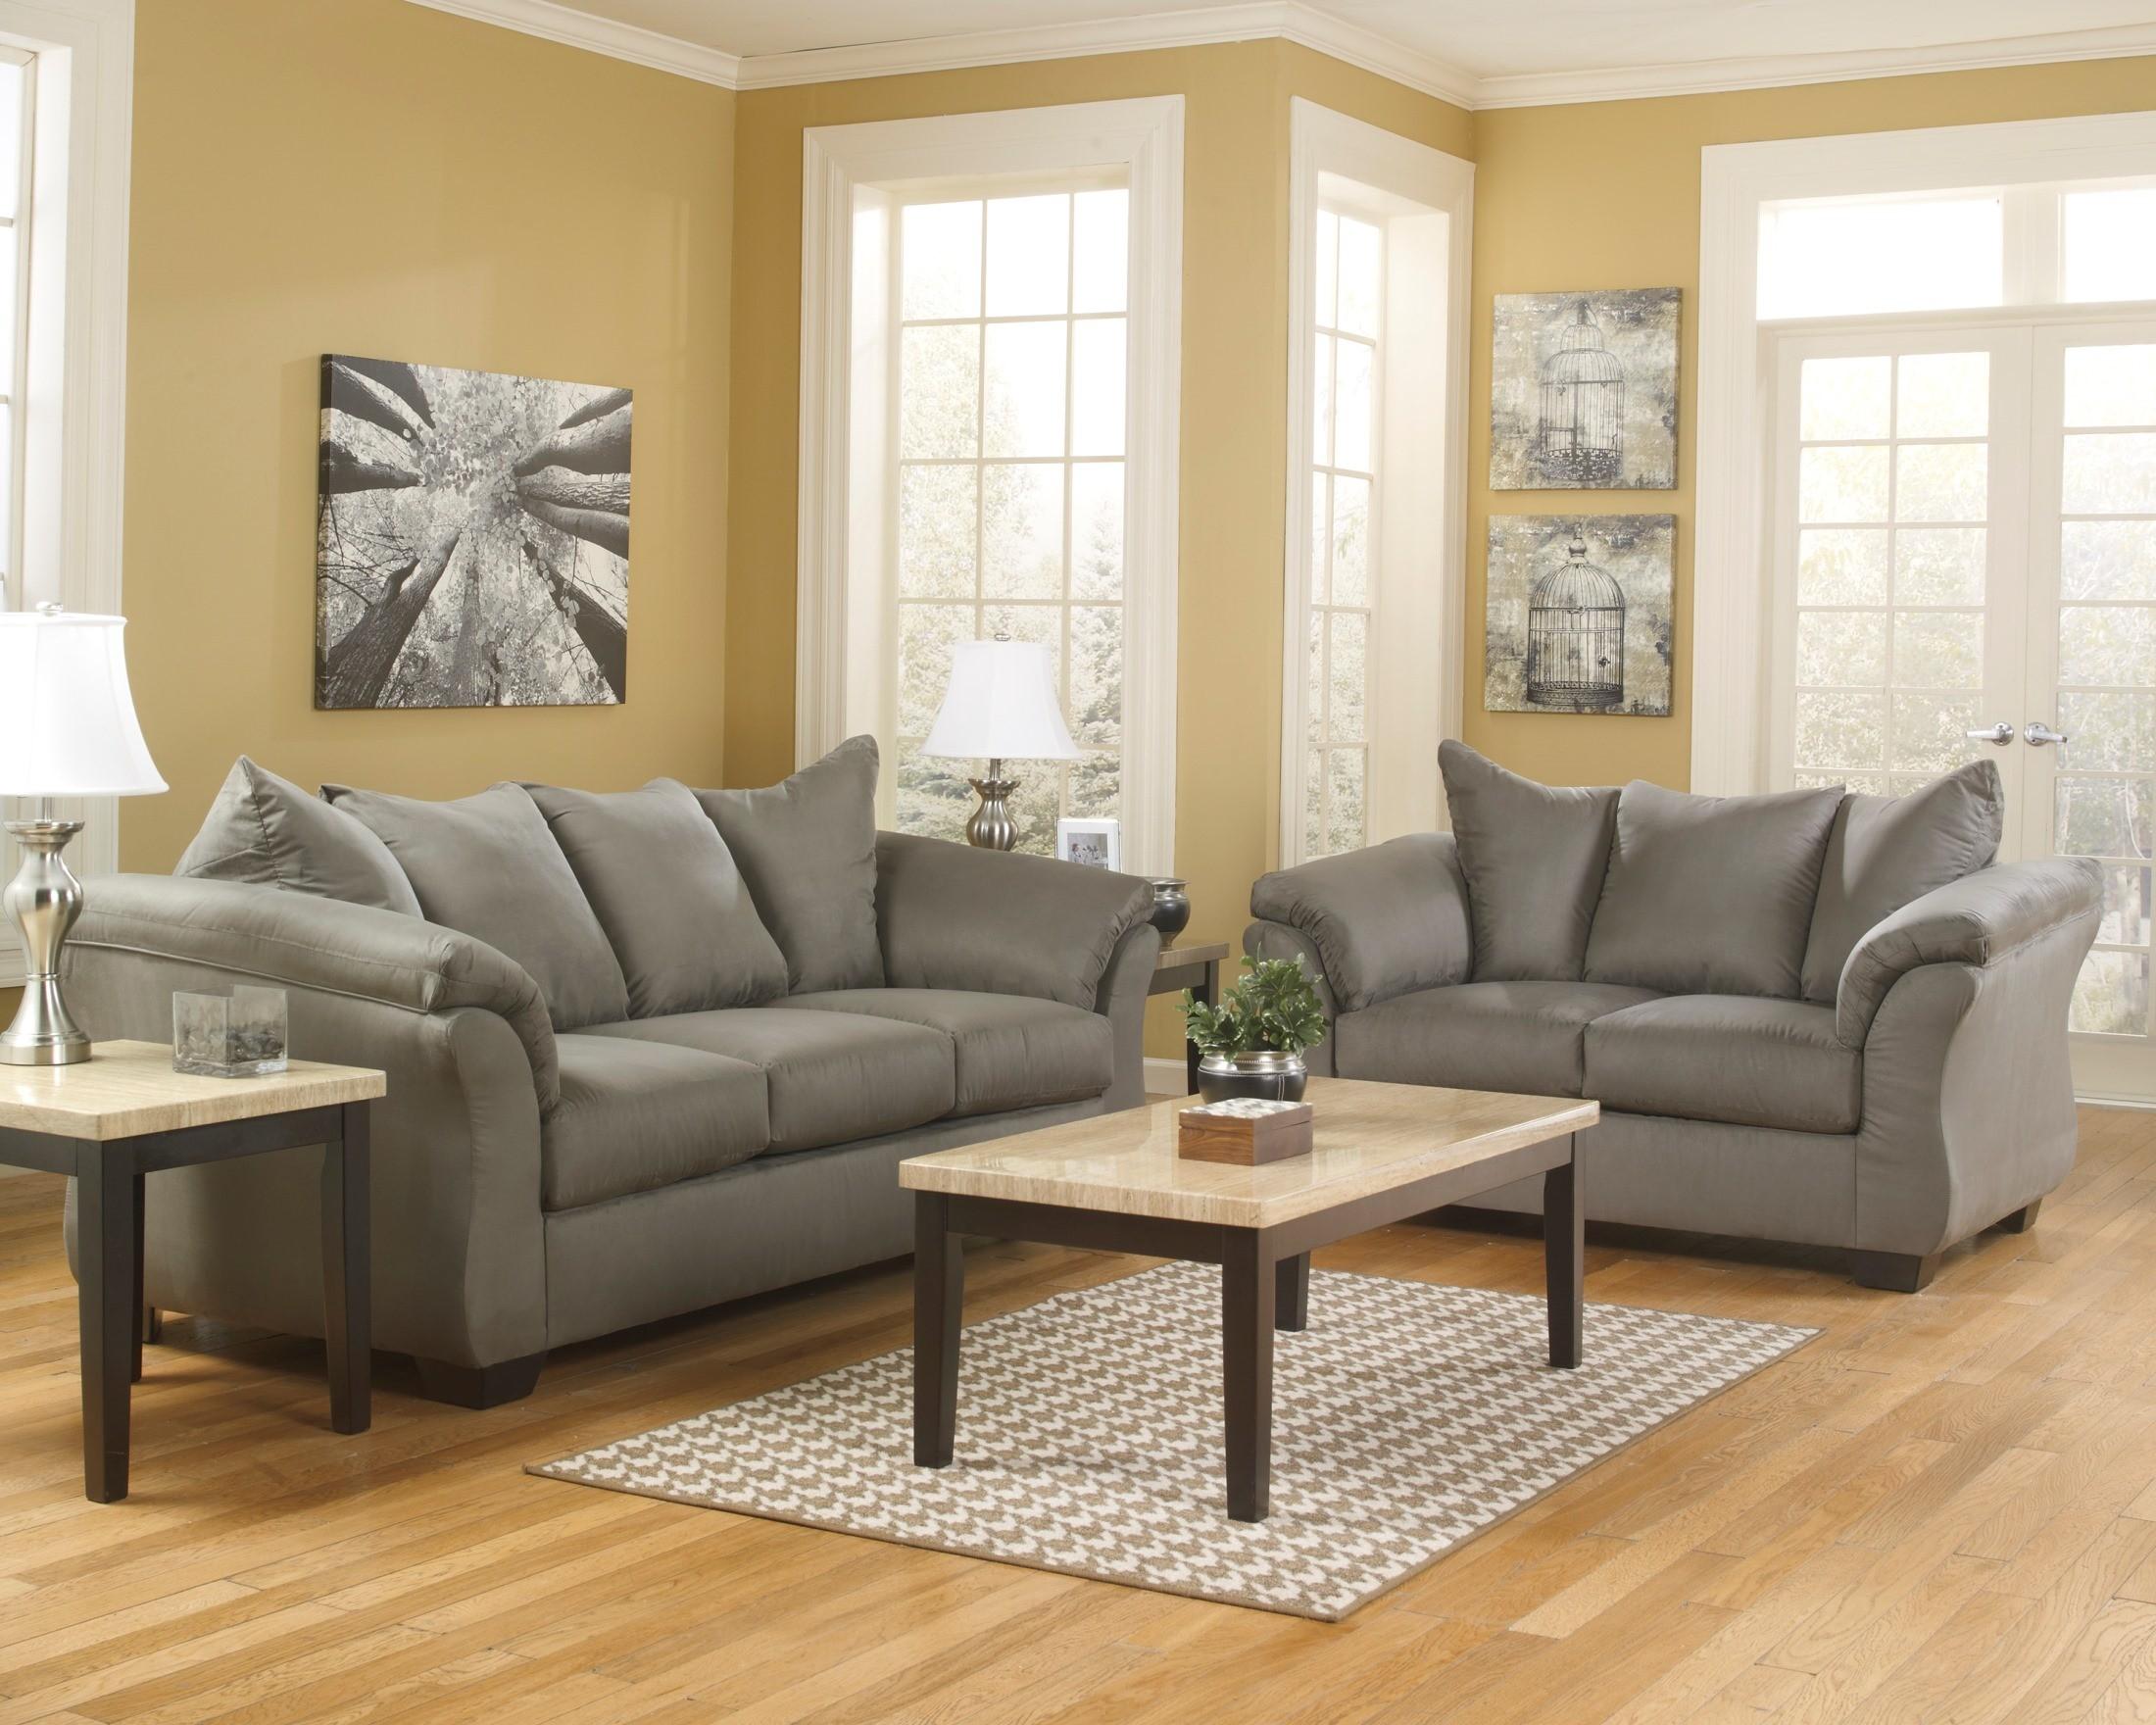 Darcy Cobblestone Living Room Set From Ashley 75005 38 35